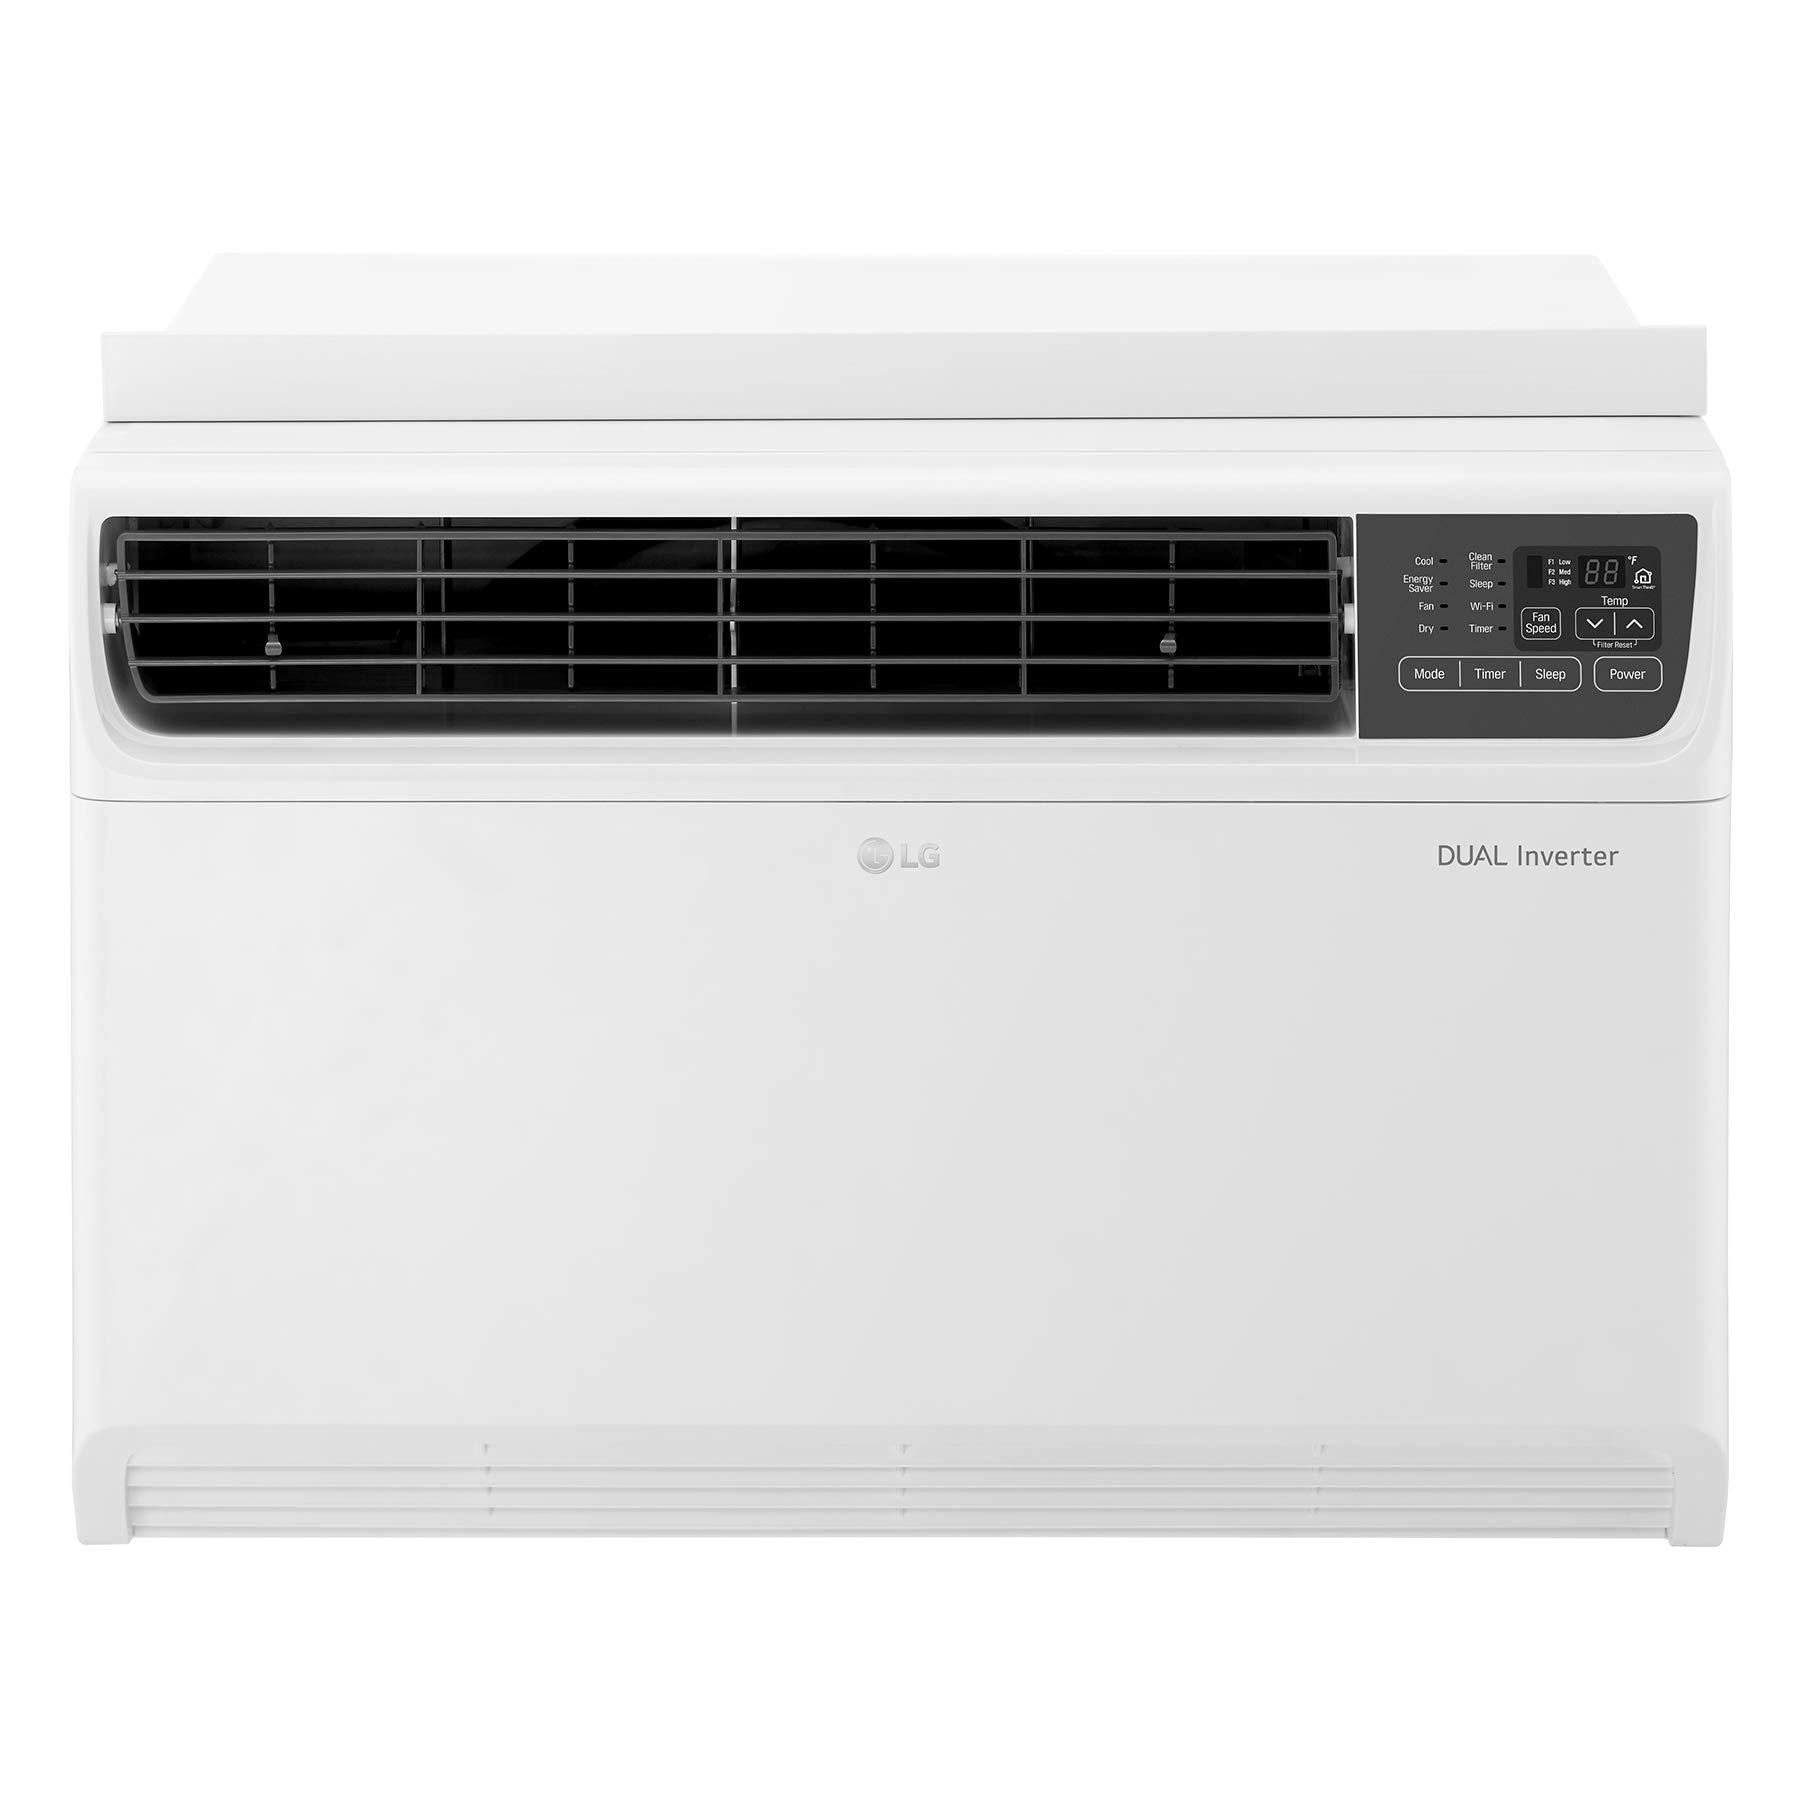 LG LW1517IVSM Window Air Conditioner, 14,000 BTU, White by LG